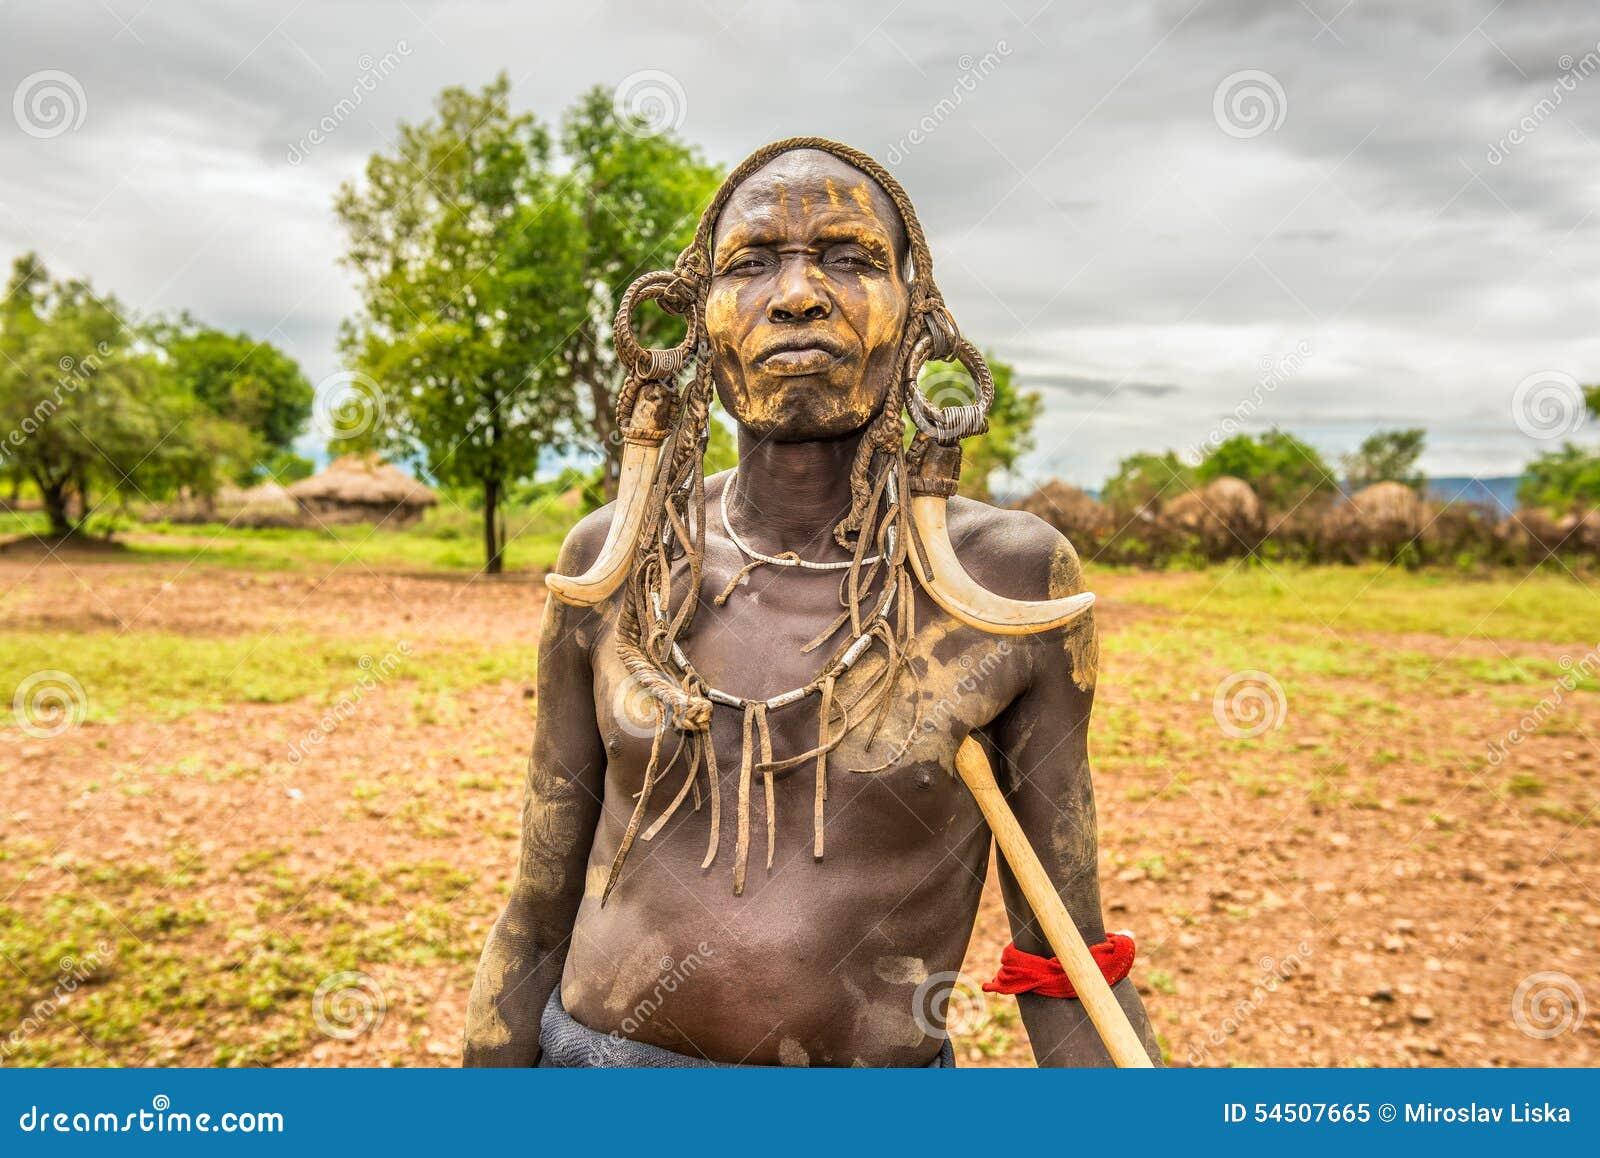 Guerrier de la tribu africaine Mursi, Ethiopie